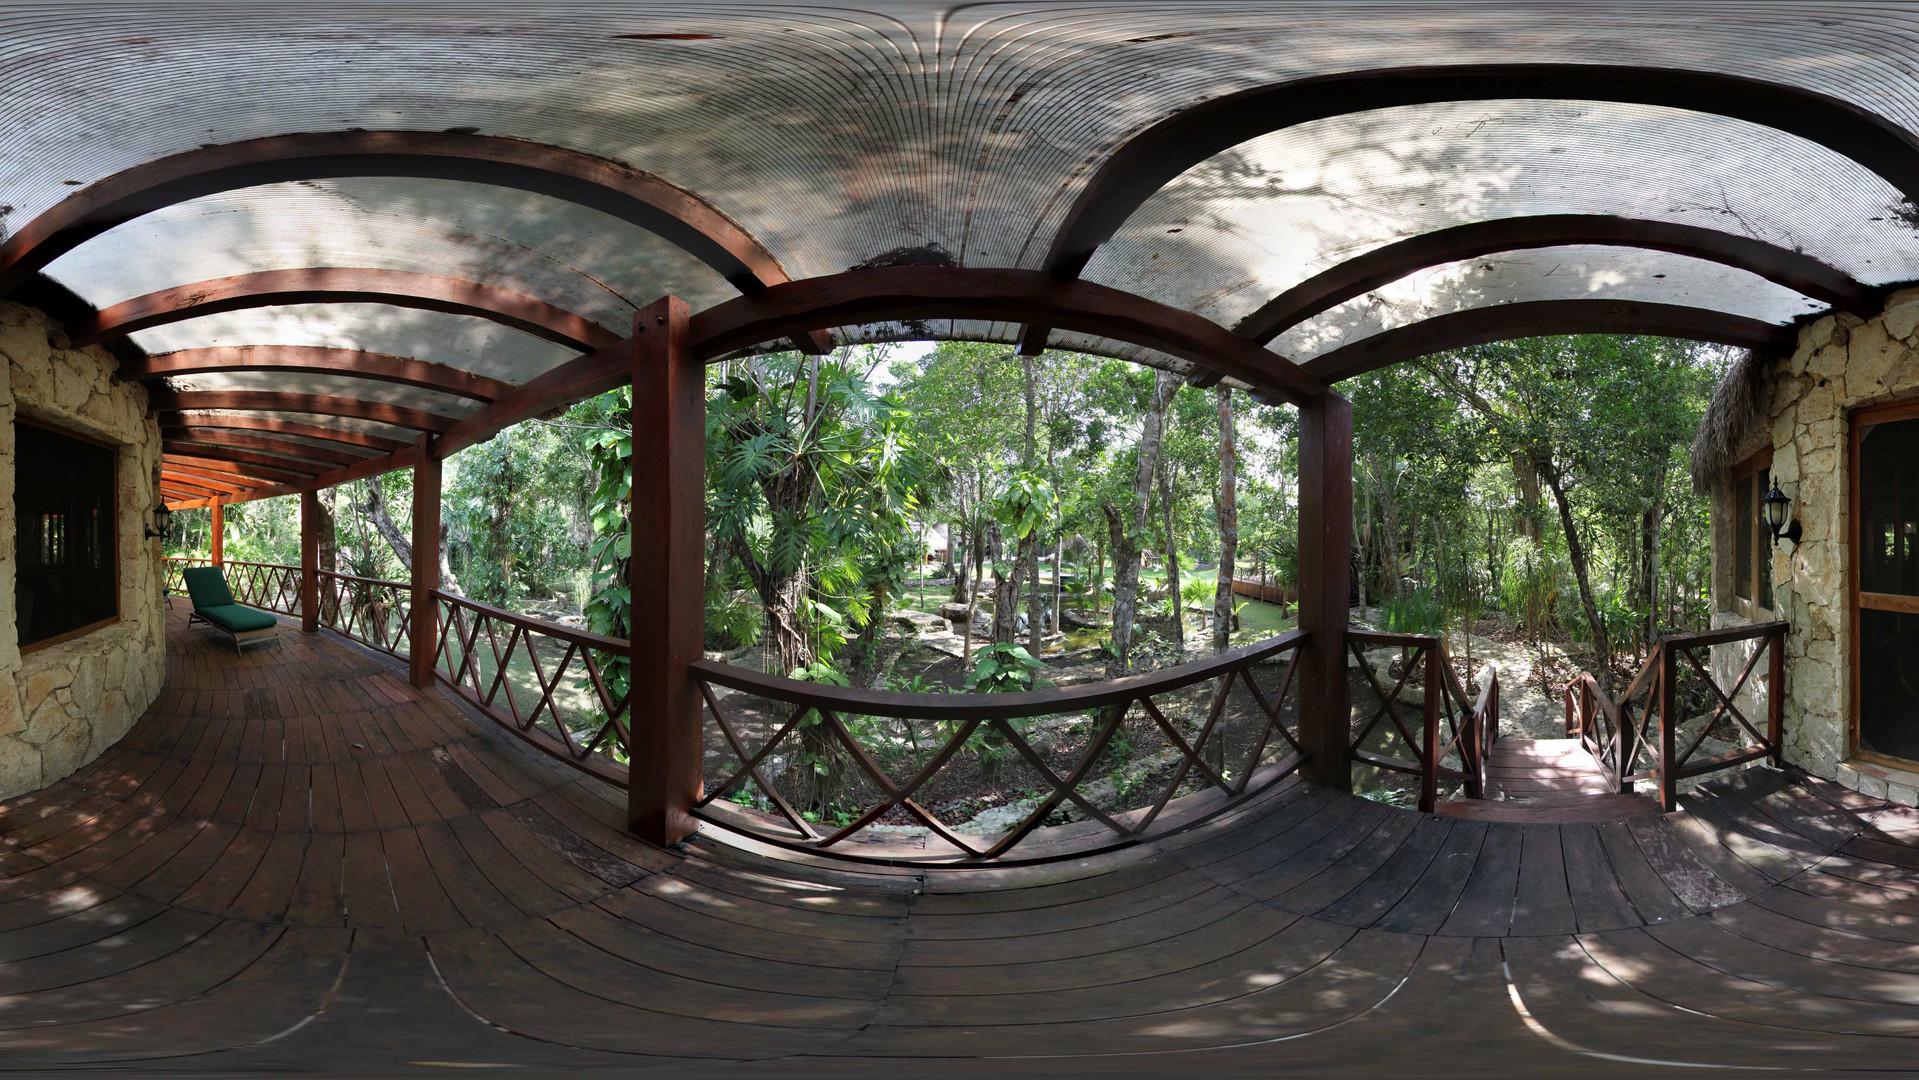 IMG_3150 Panorama.jpg